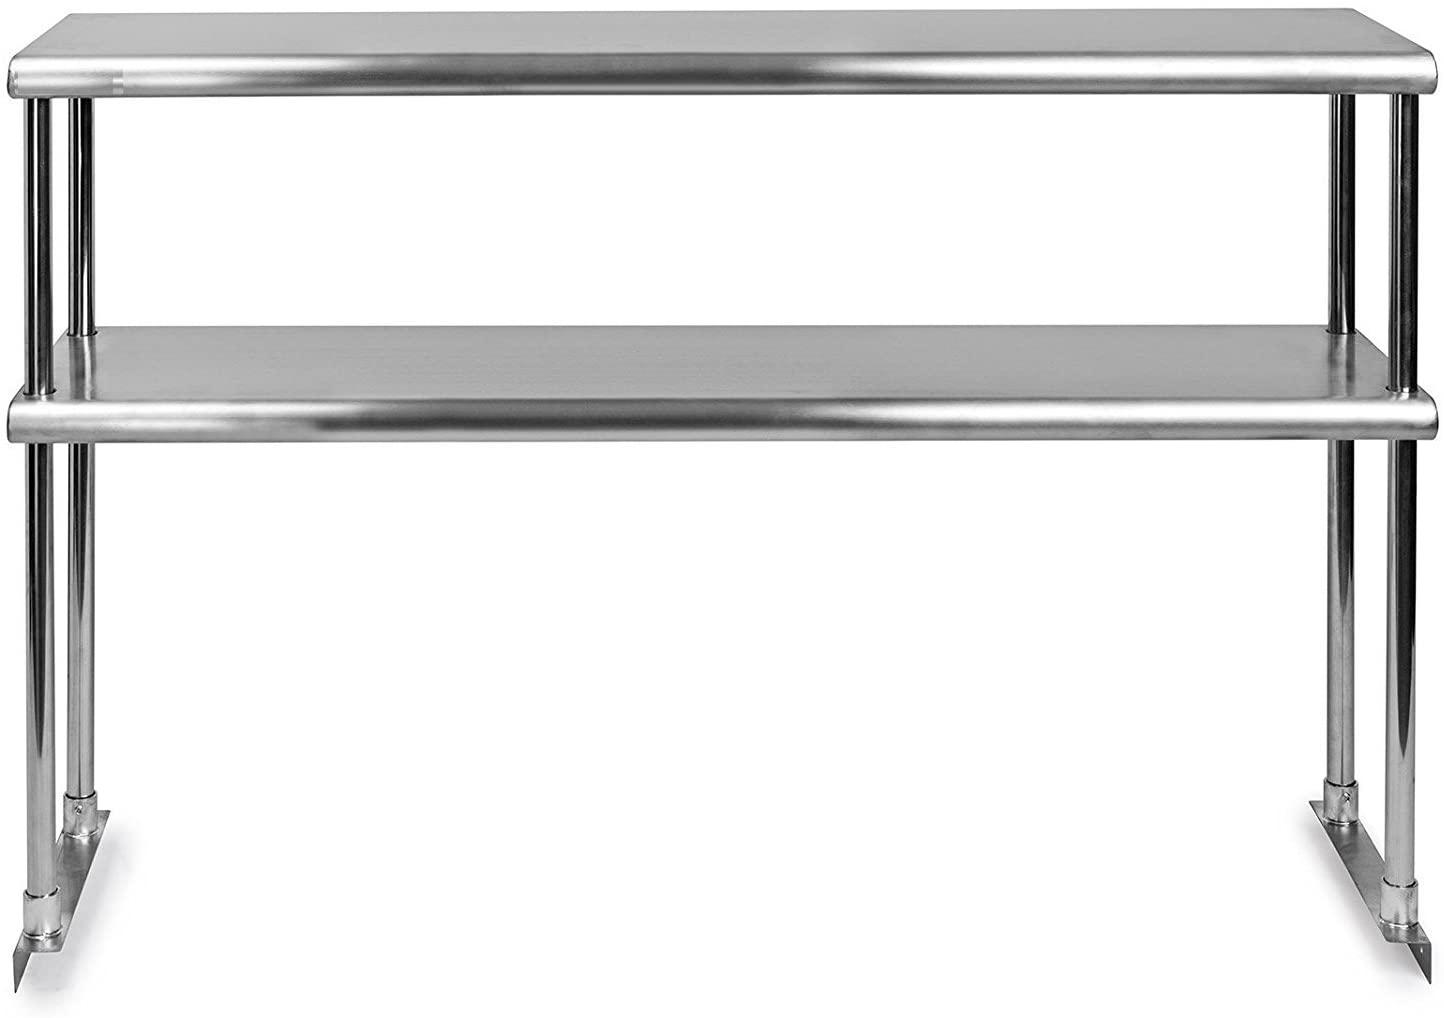 KPS Stainless Steel Double Overshelf for Prep Work Table 18 x 30 - NSF